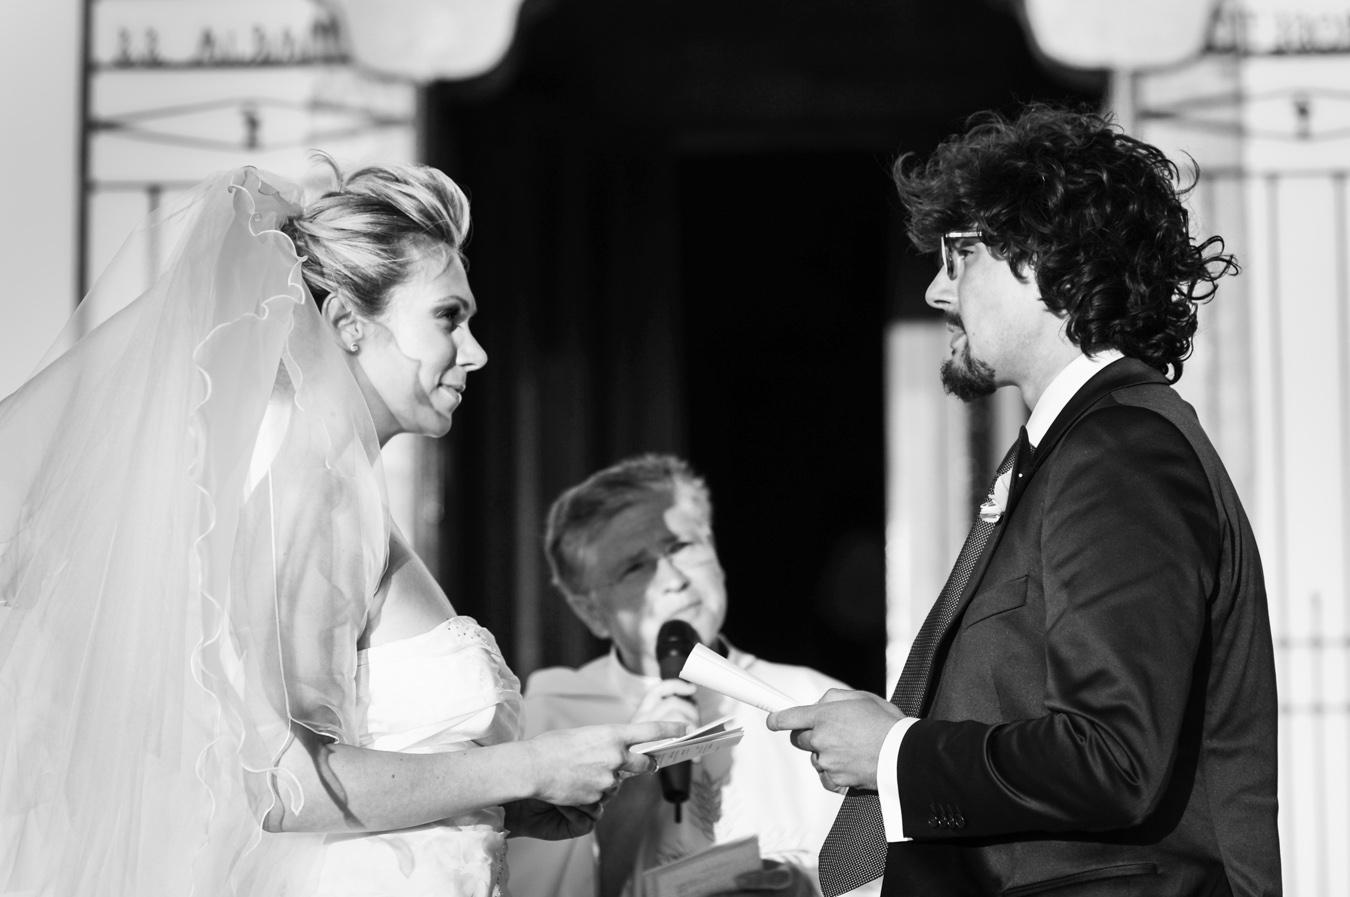 Alessandro Borghese e Wilma Olivero, Telese, 2009